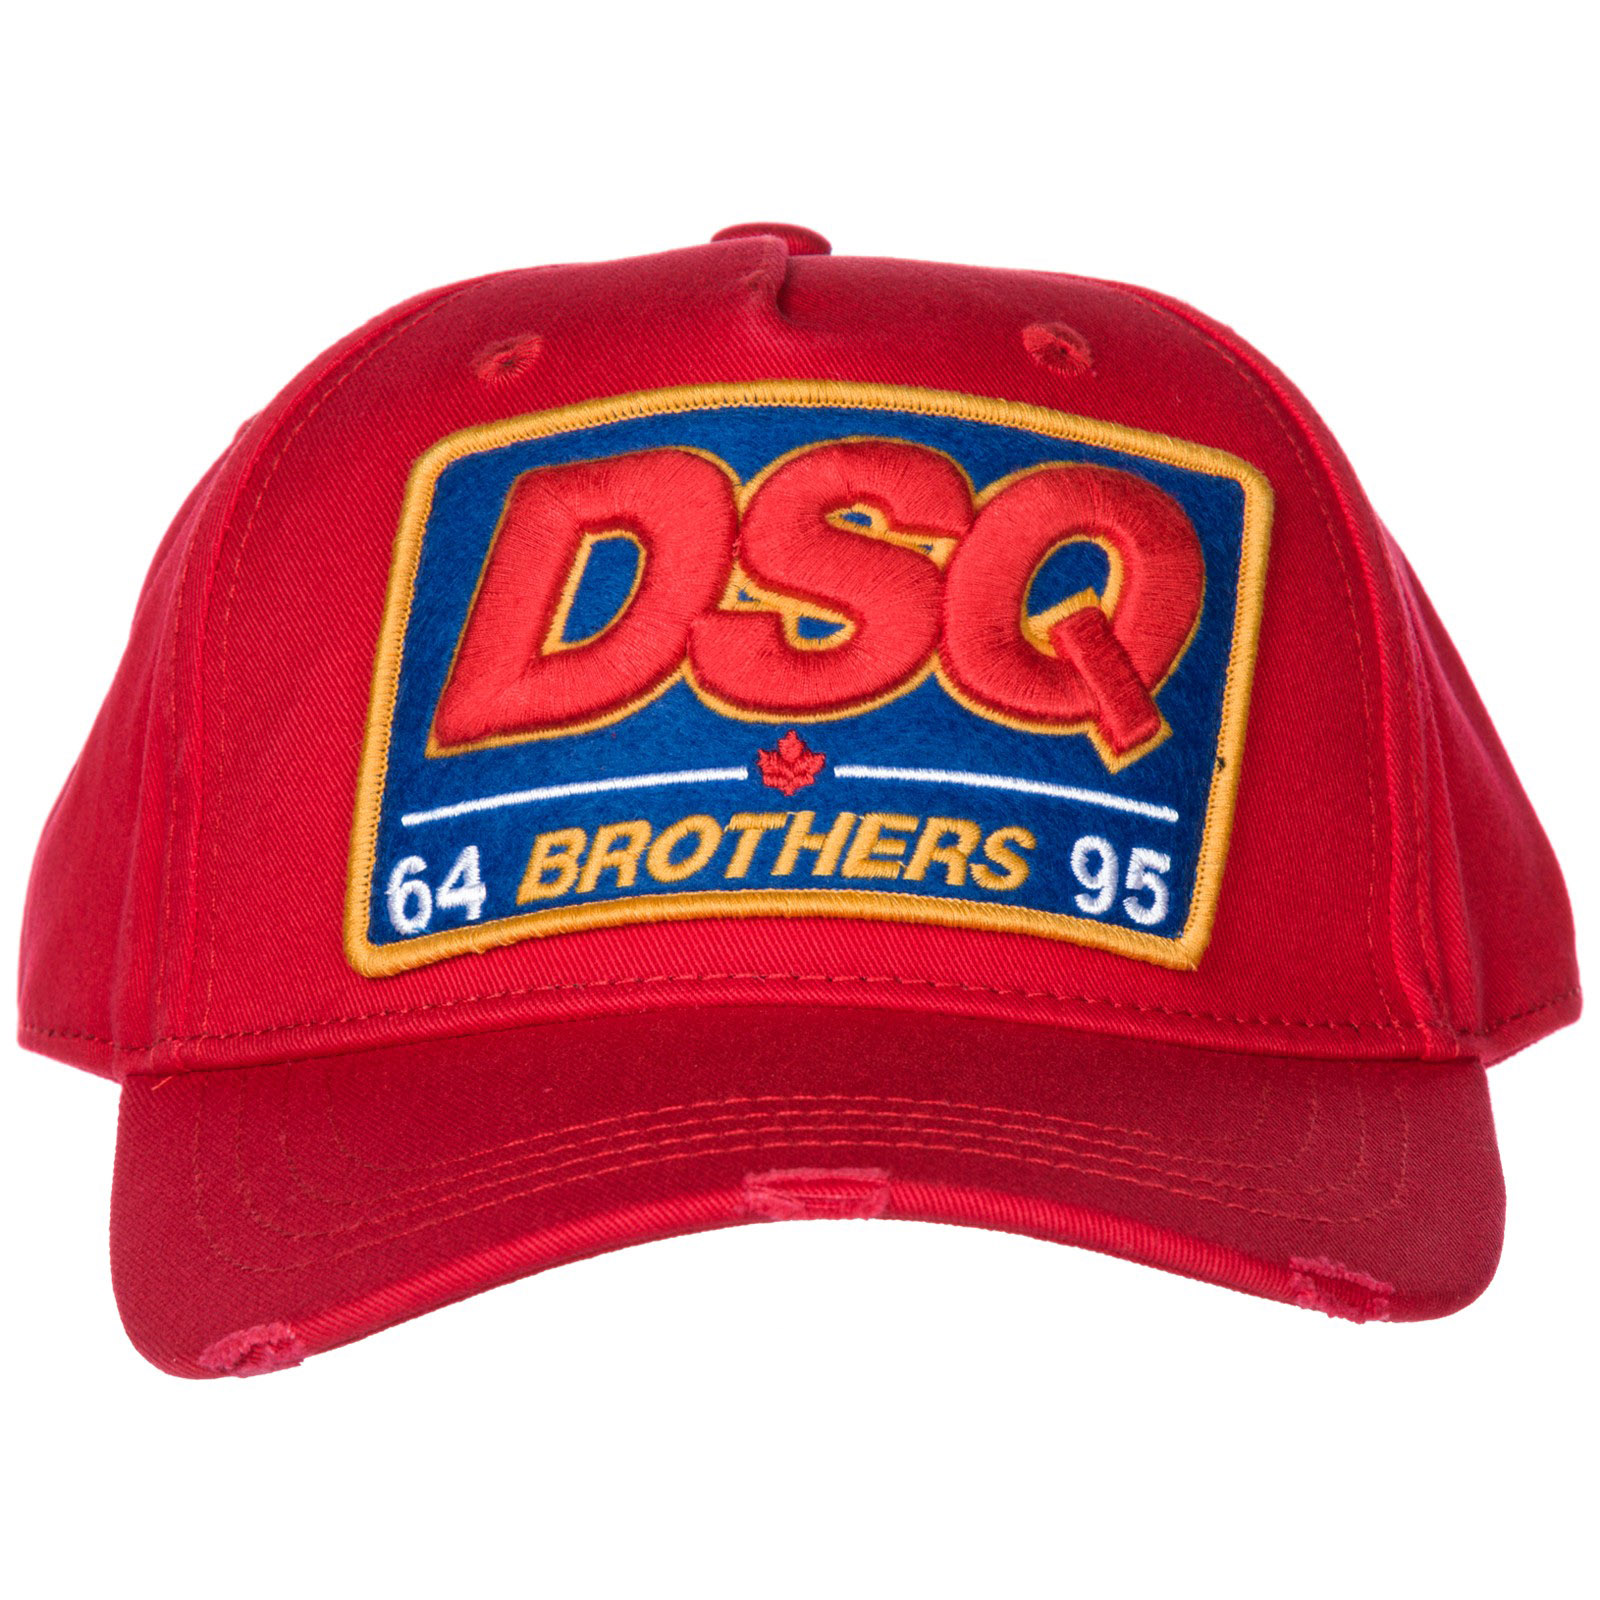 87dfeae30 Adjustable hat baseball cap dsq brothers